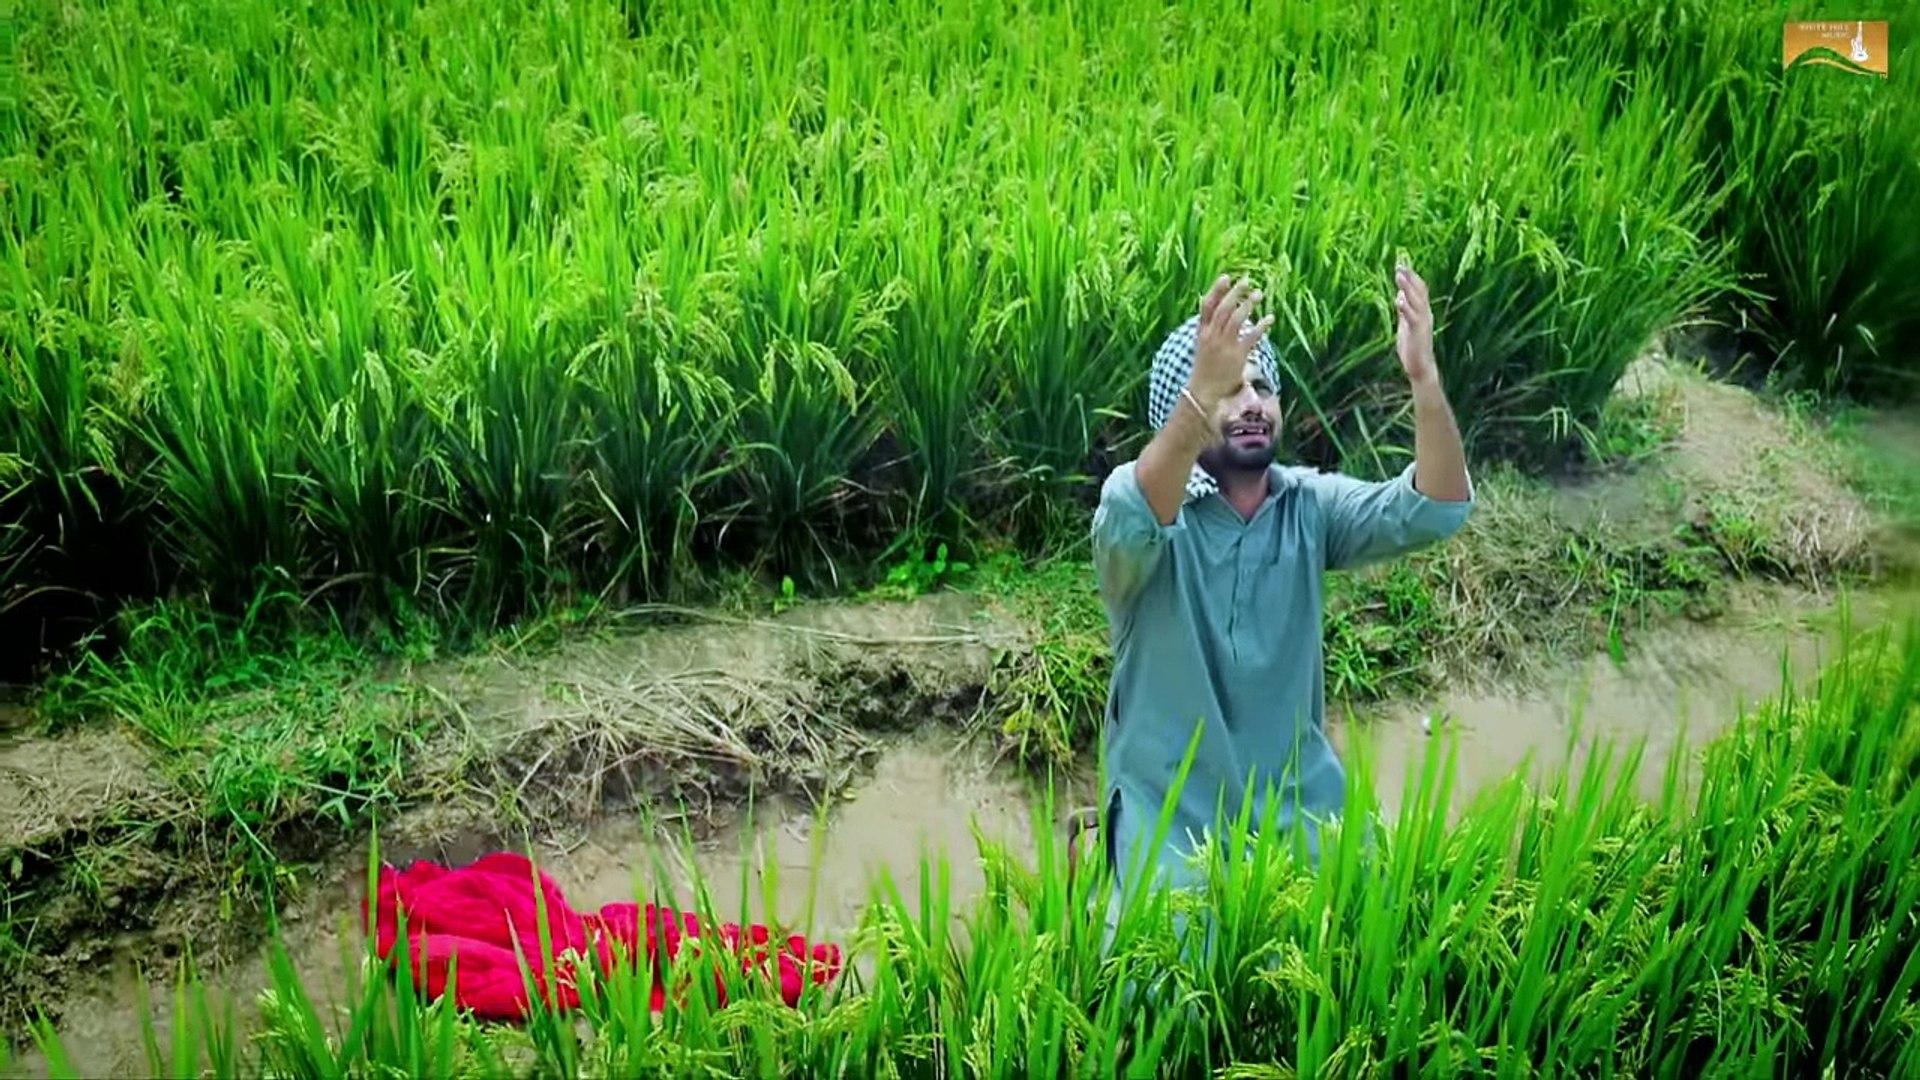 (18) Latest Punjabi Songs 2017 - Takkdi (Full Song) Kanwar Grewal - New Punjabi Song 2017- Punjabi S